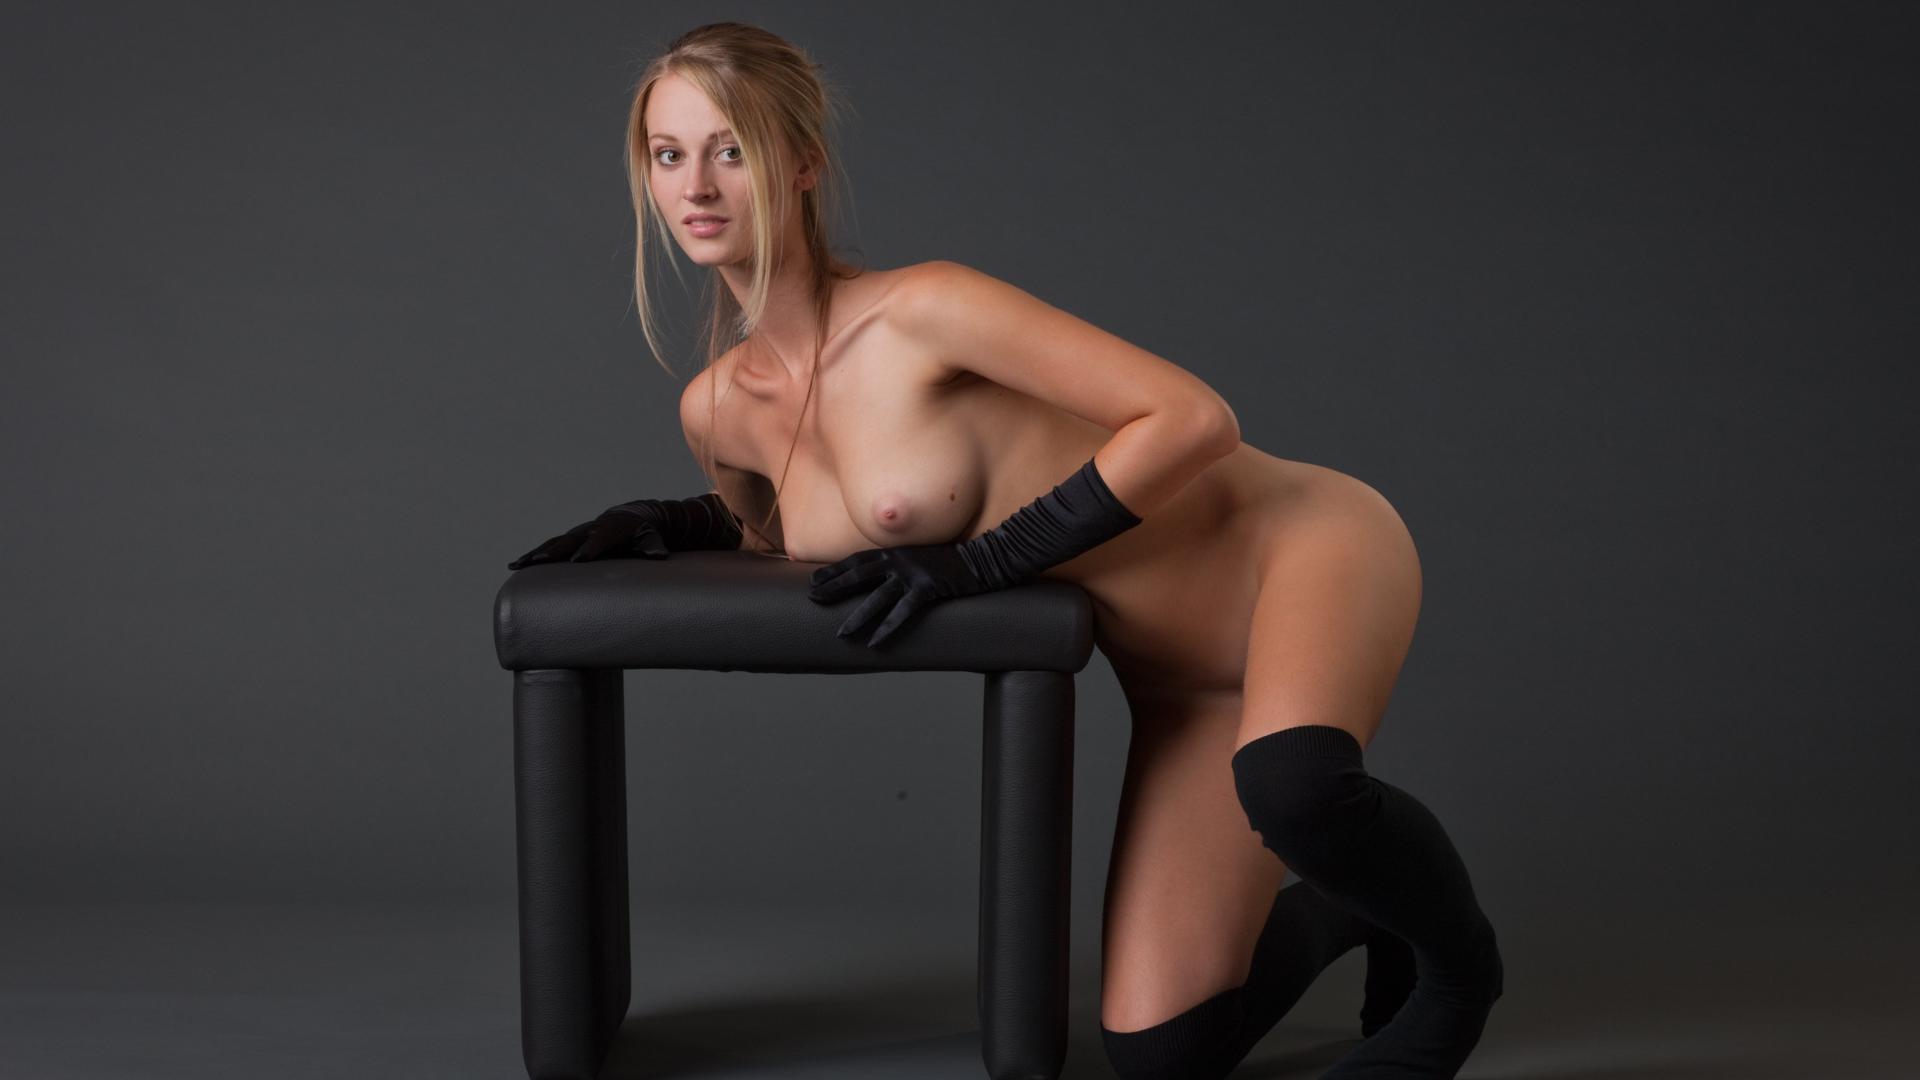 big size woman naked